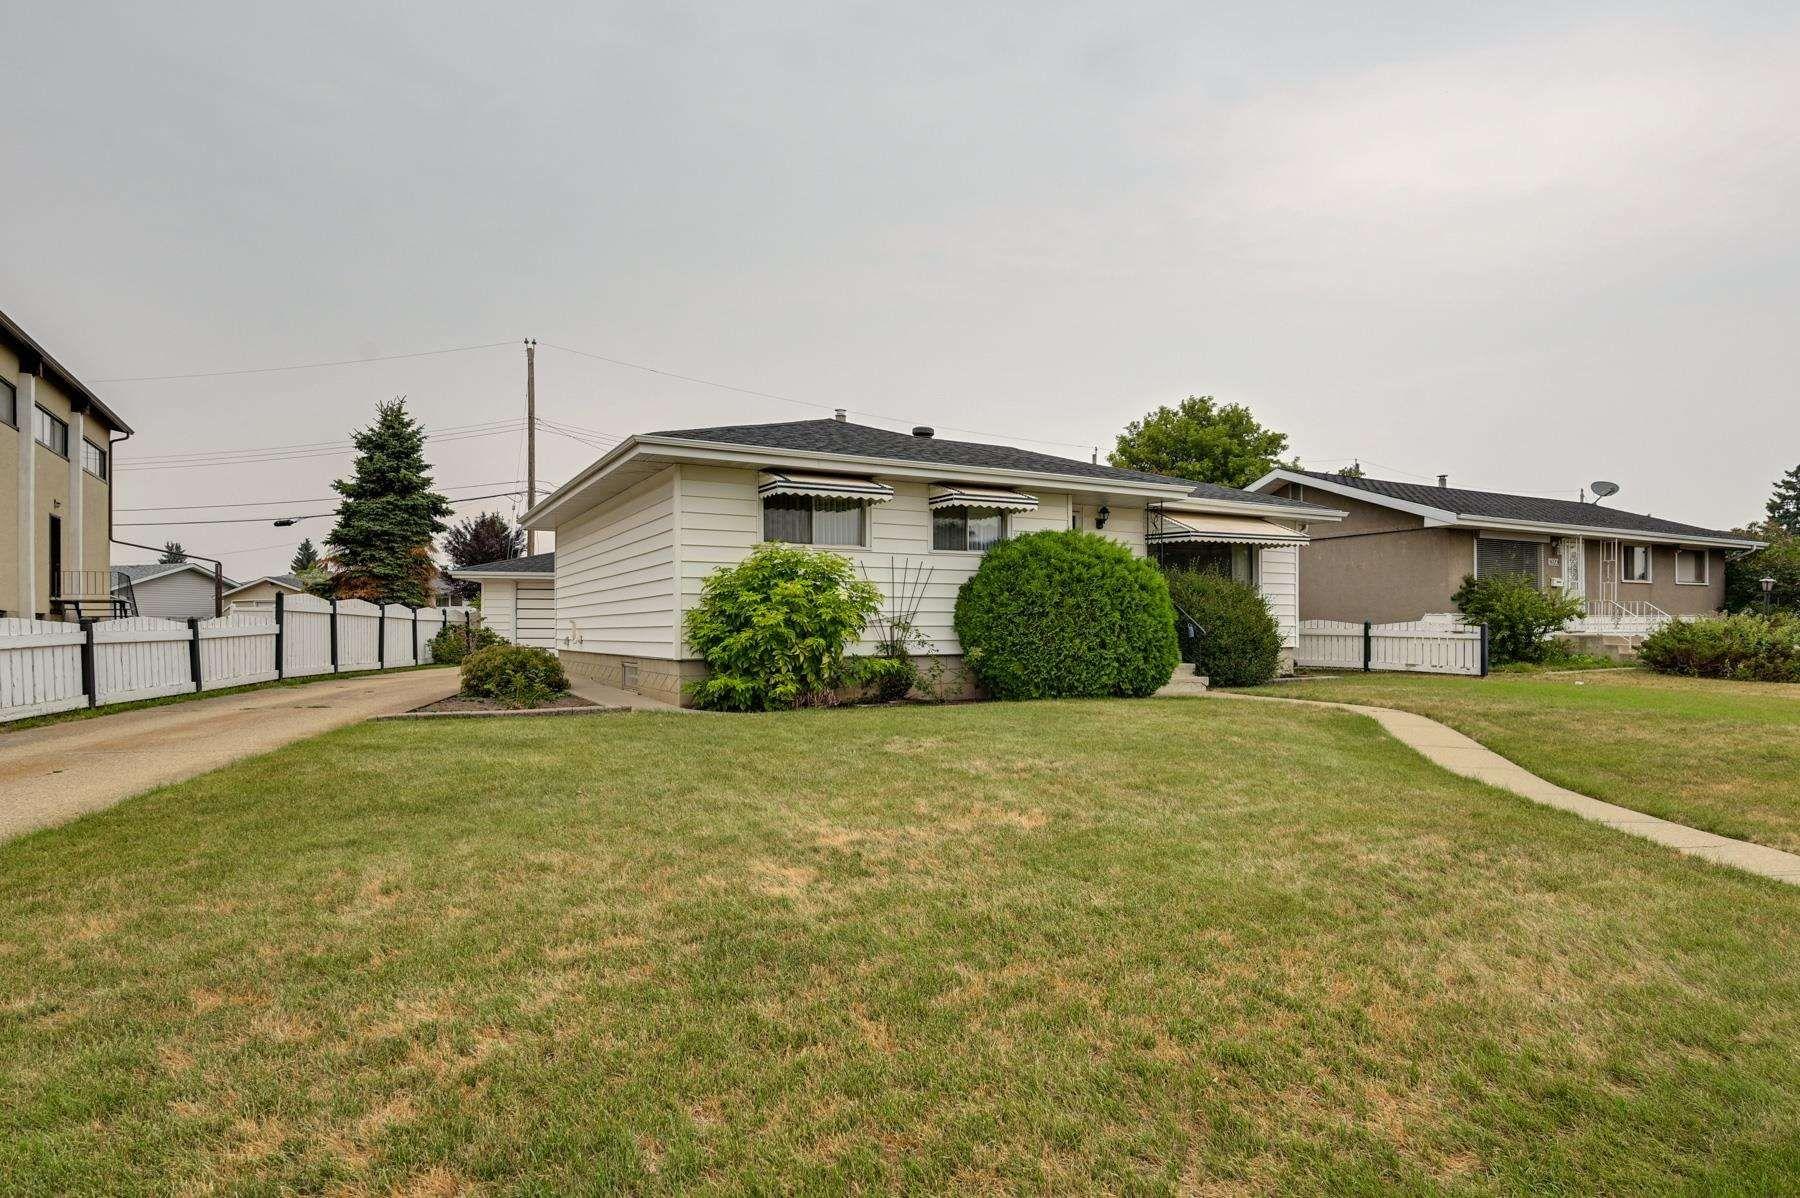 Main Photo: 8924 135 Avenue in Edmonton: Zone 02 House for sale : MLS®# E4257137